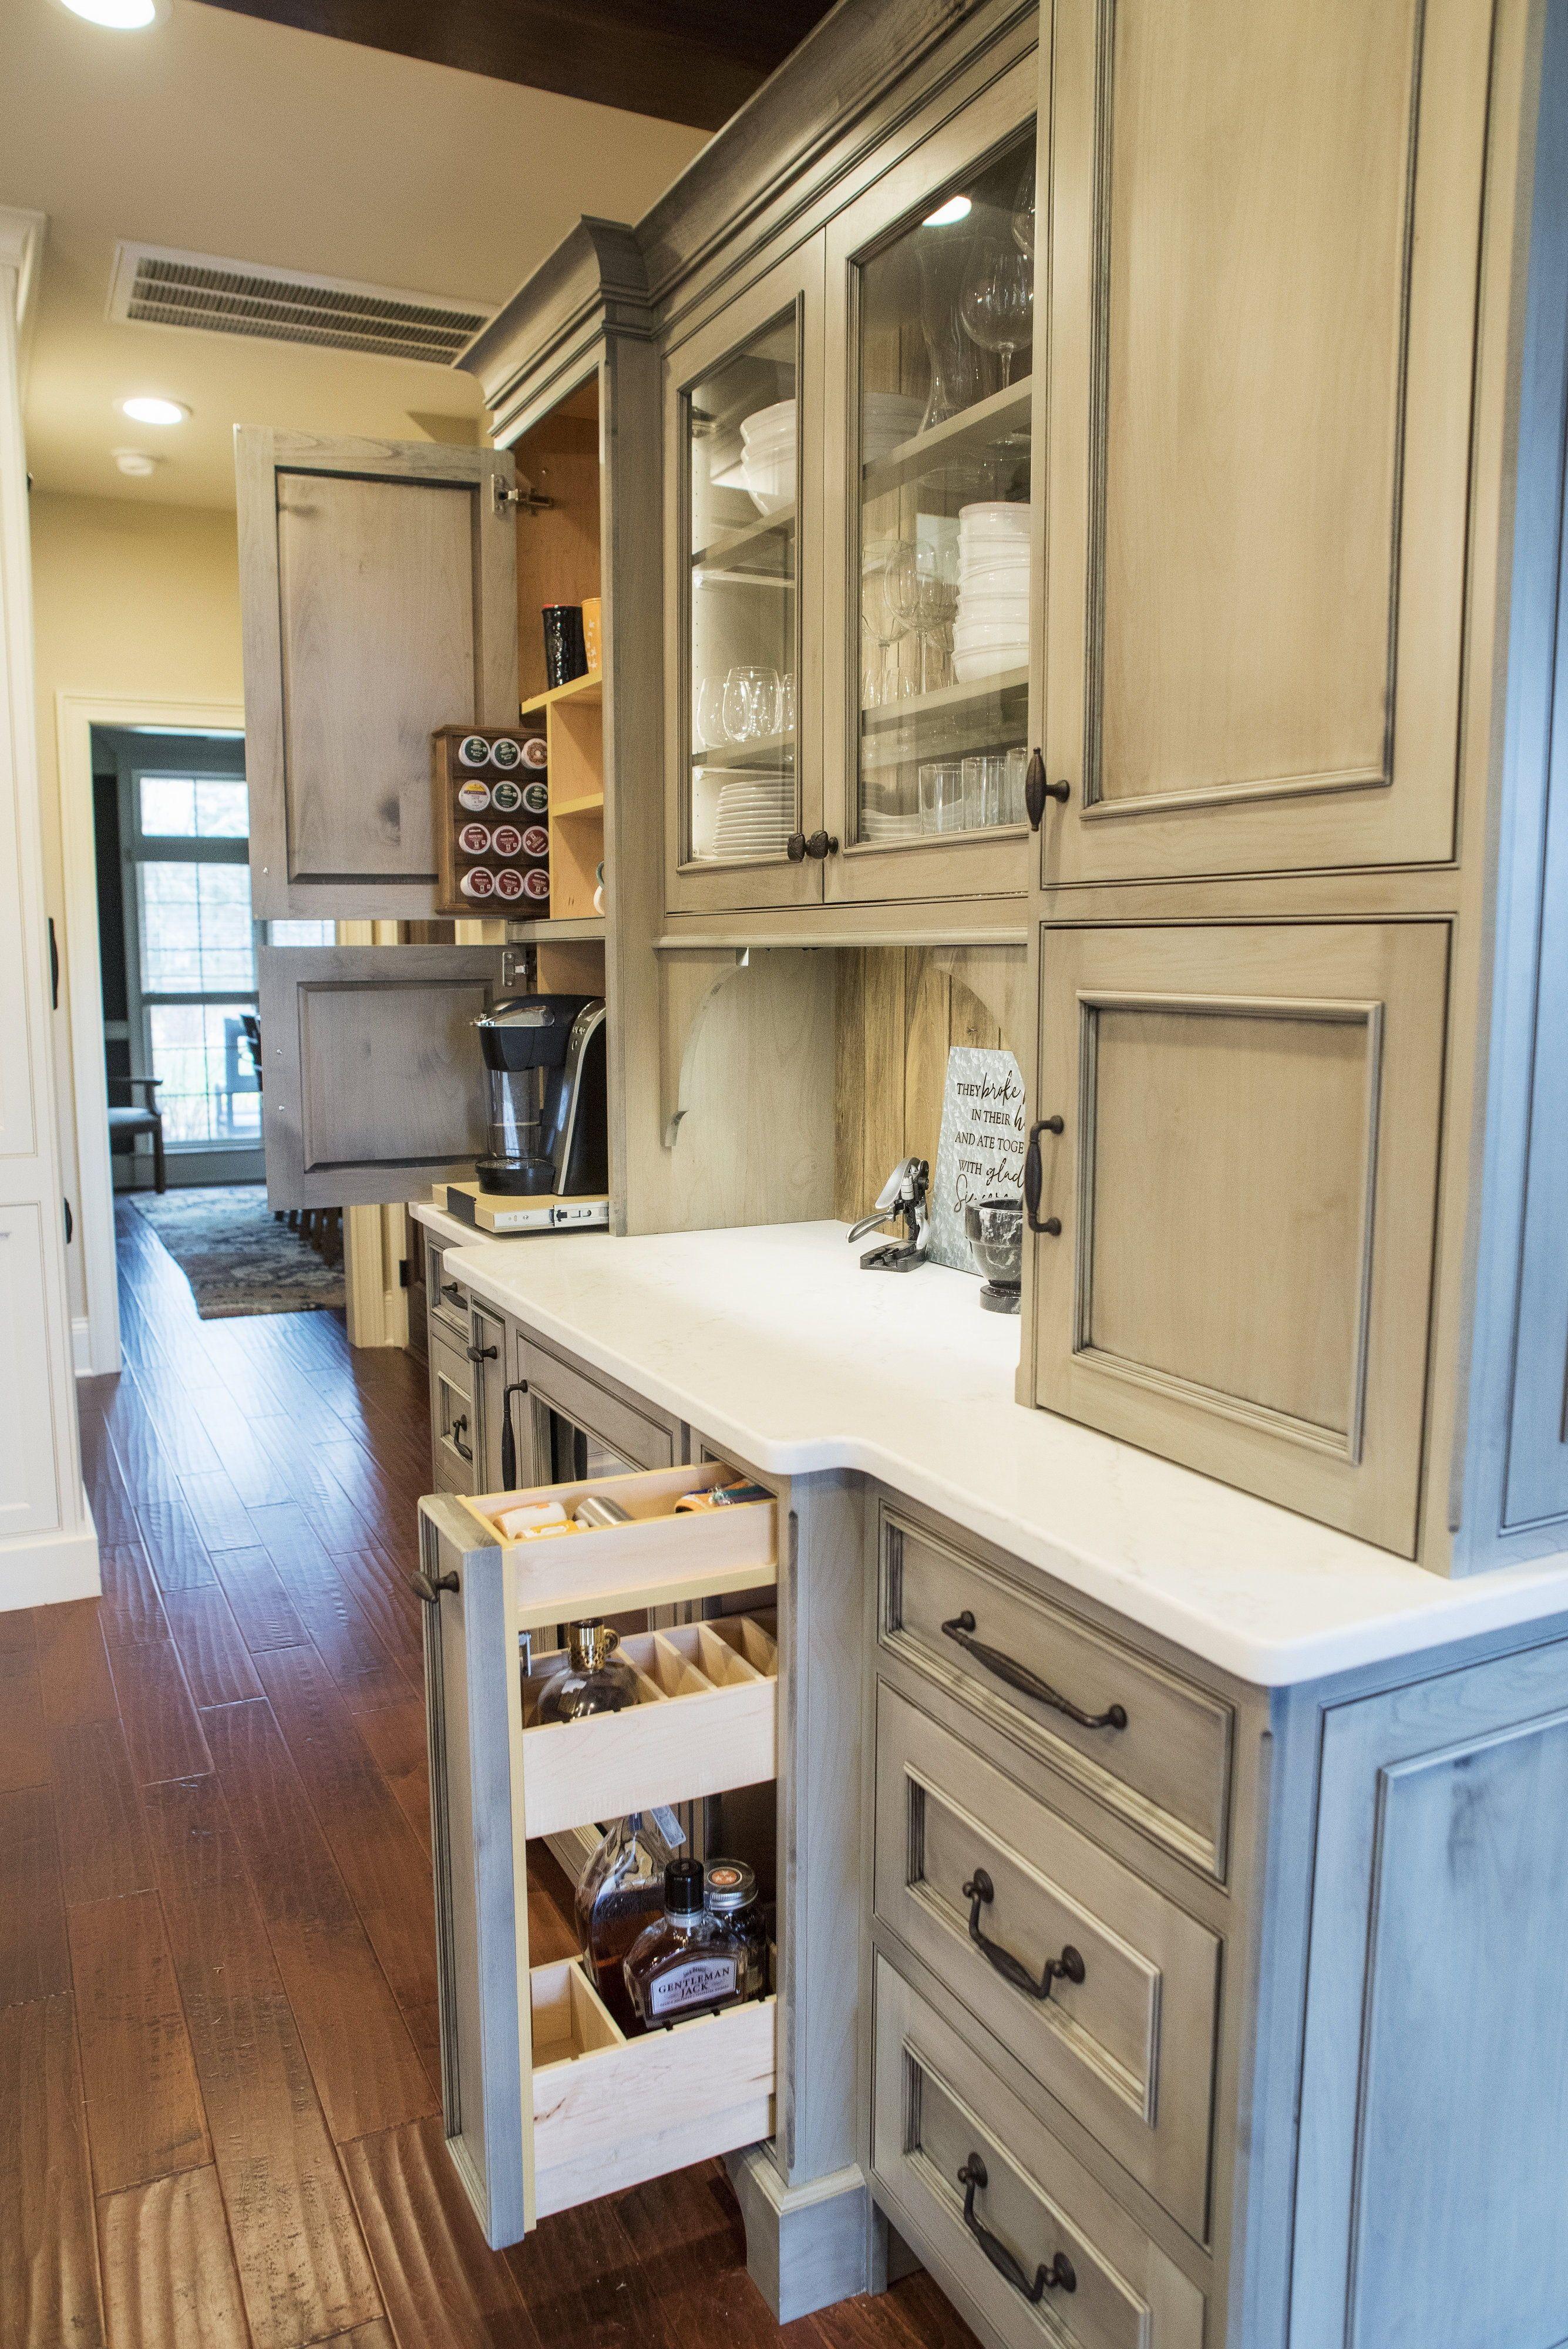 Crystal Cabinets Kitchen Remodel Kitchen Cabinet Styles Custom Kitchen Cabinets